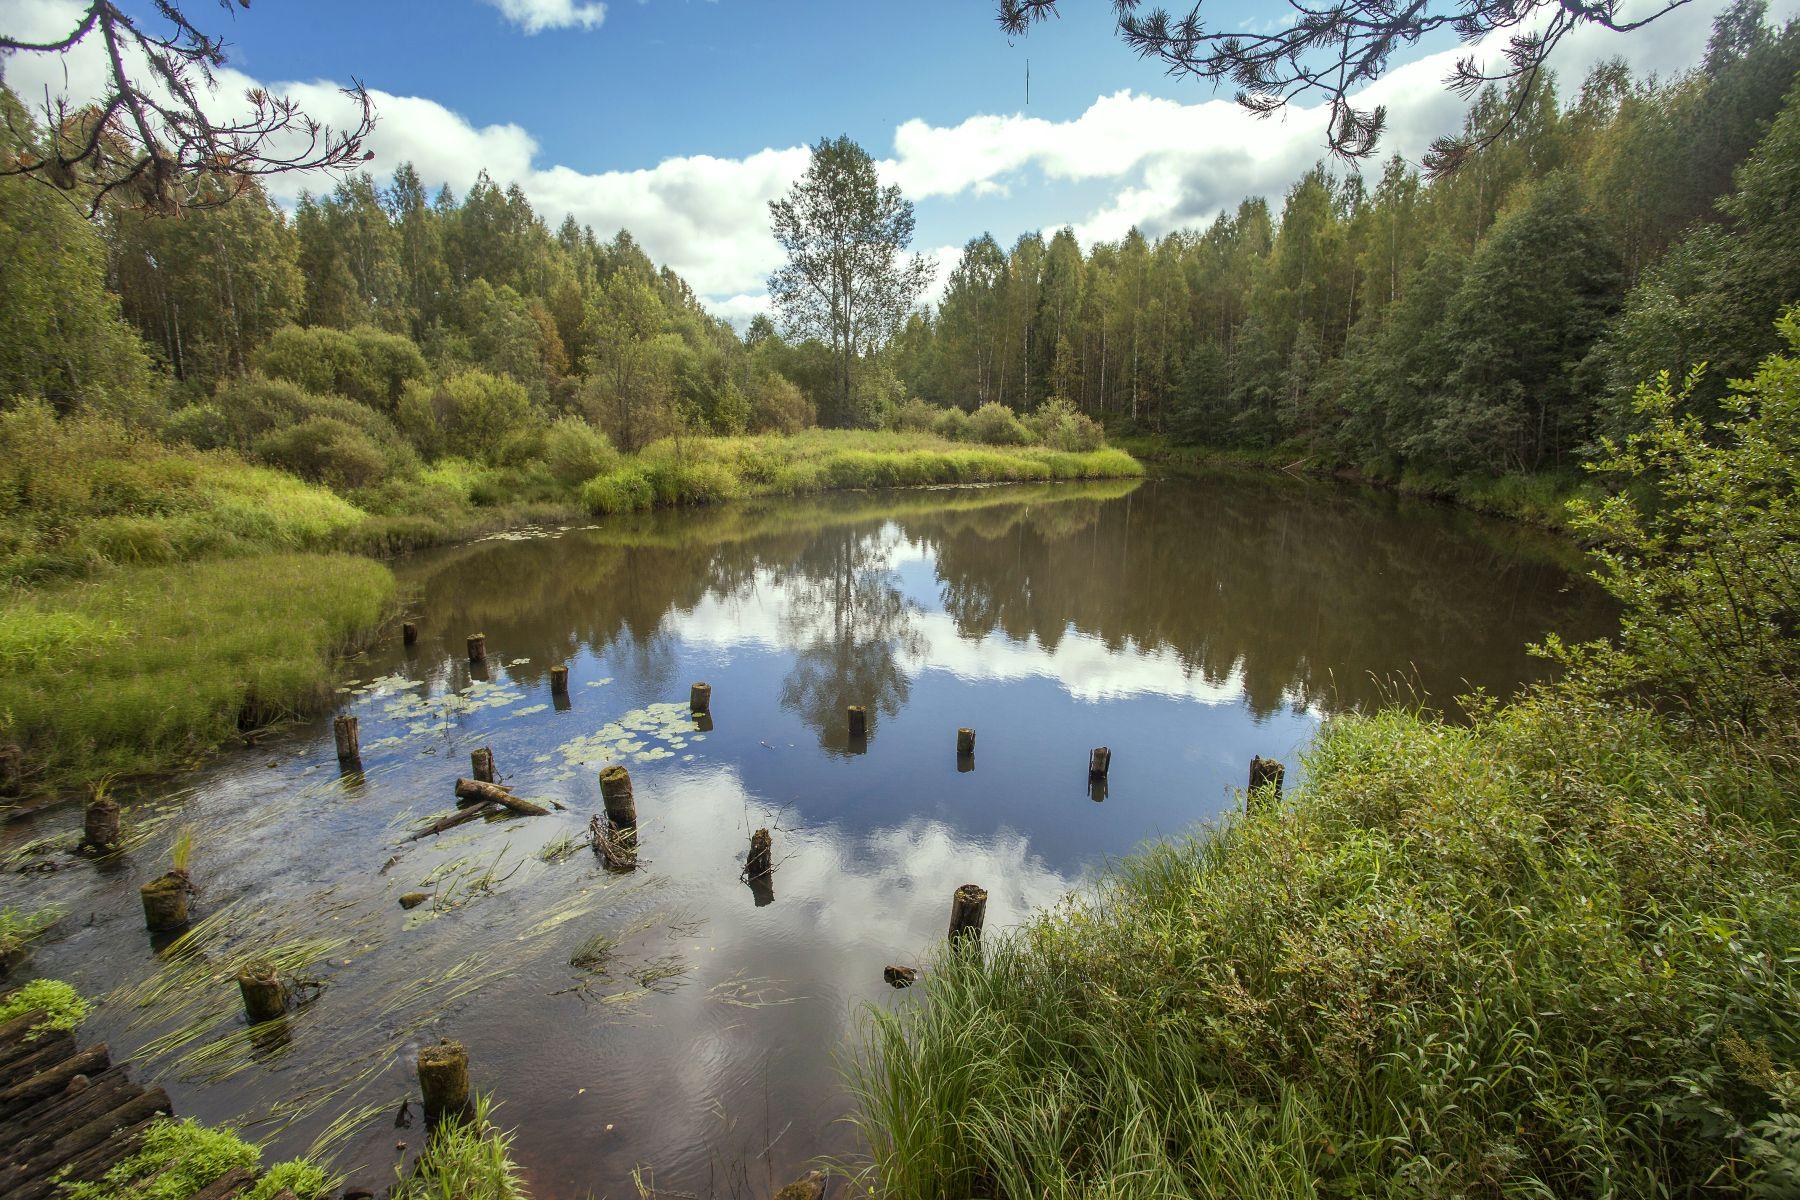 Река Федоровка. Фото А. А. Широких